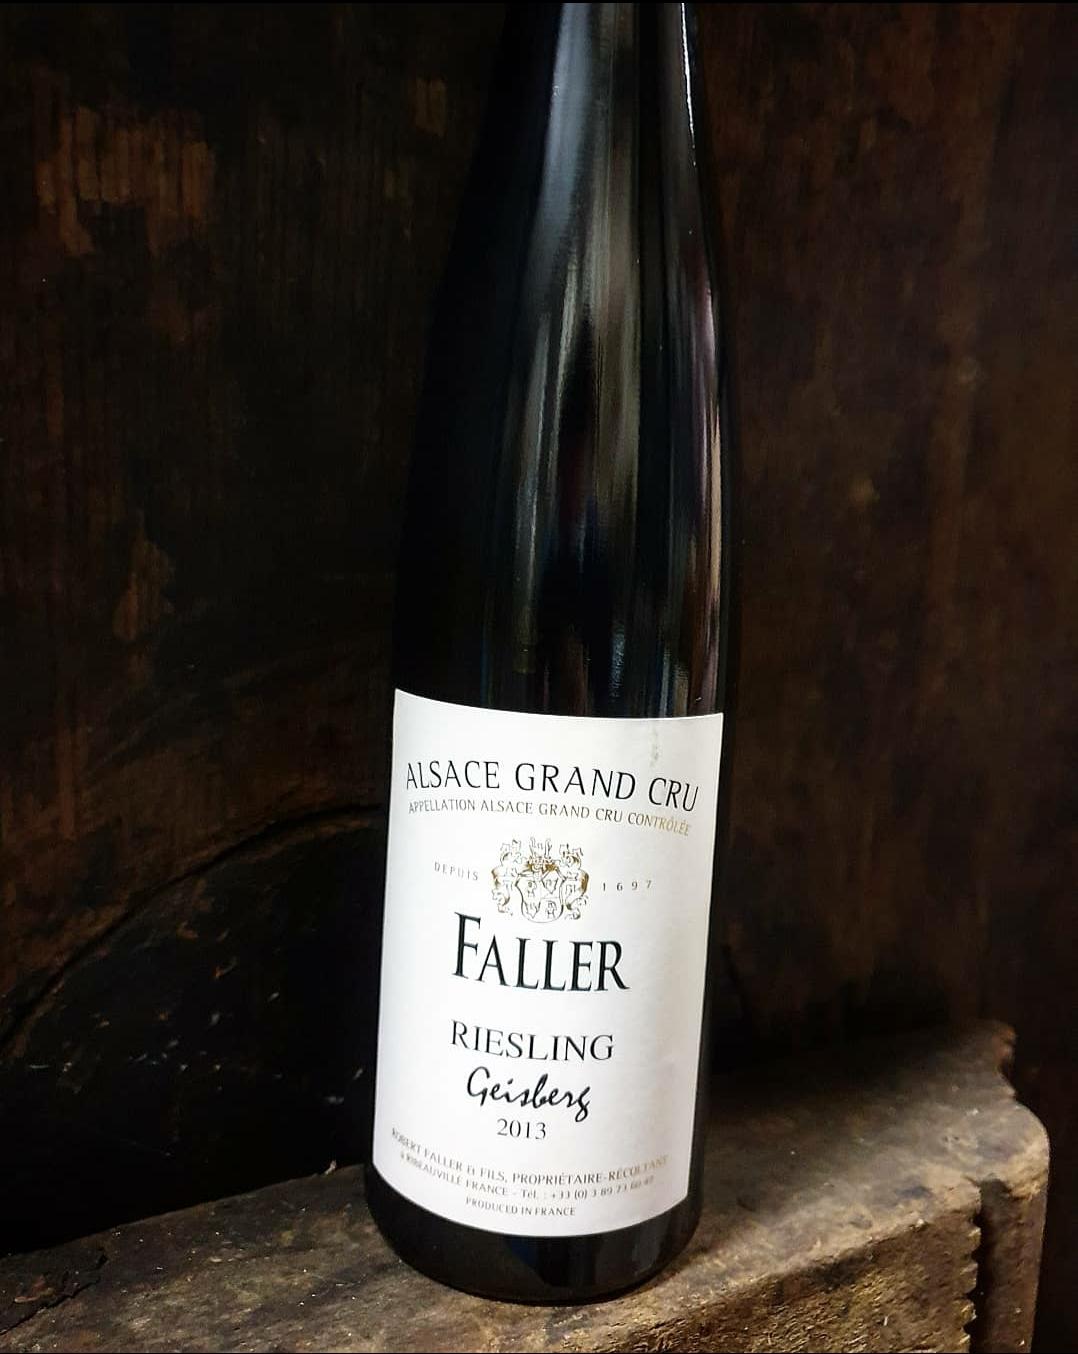 alsace-grand-cru-vins-faller